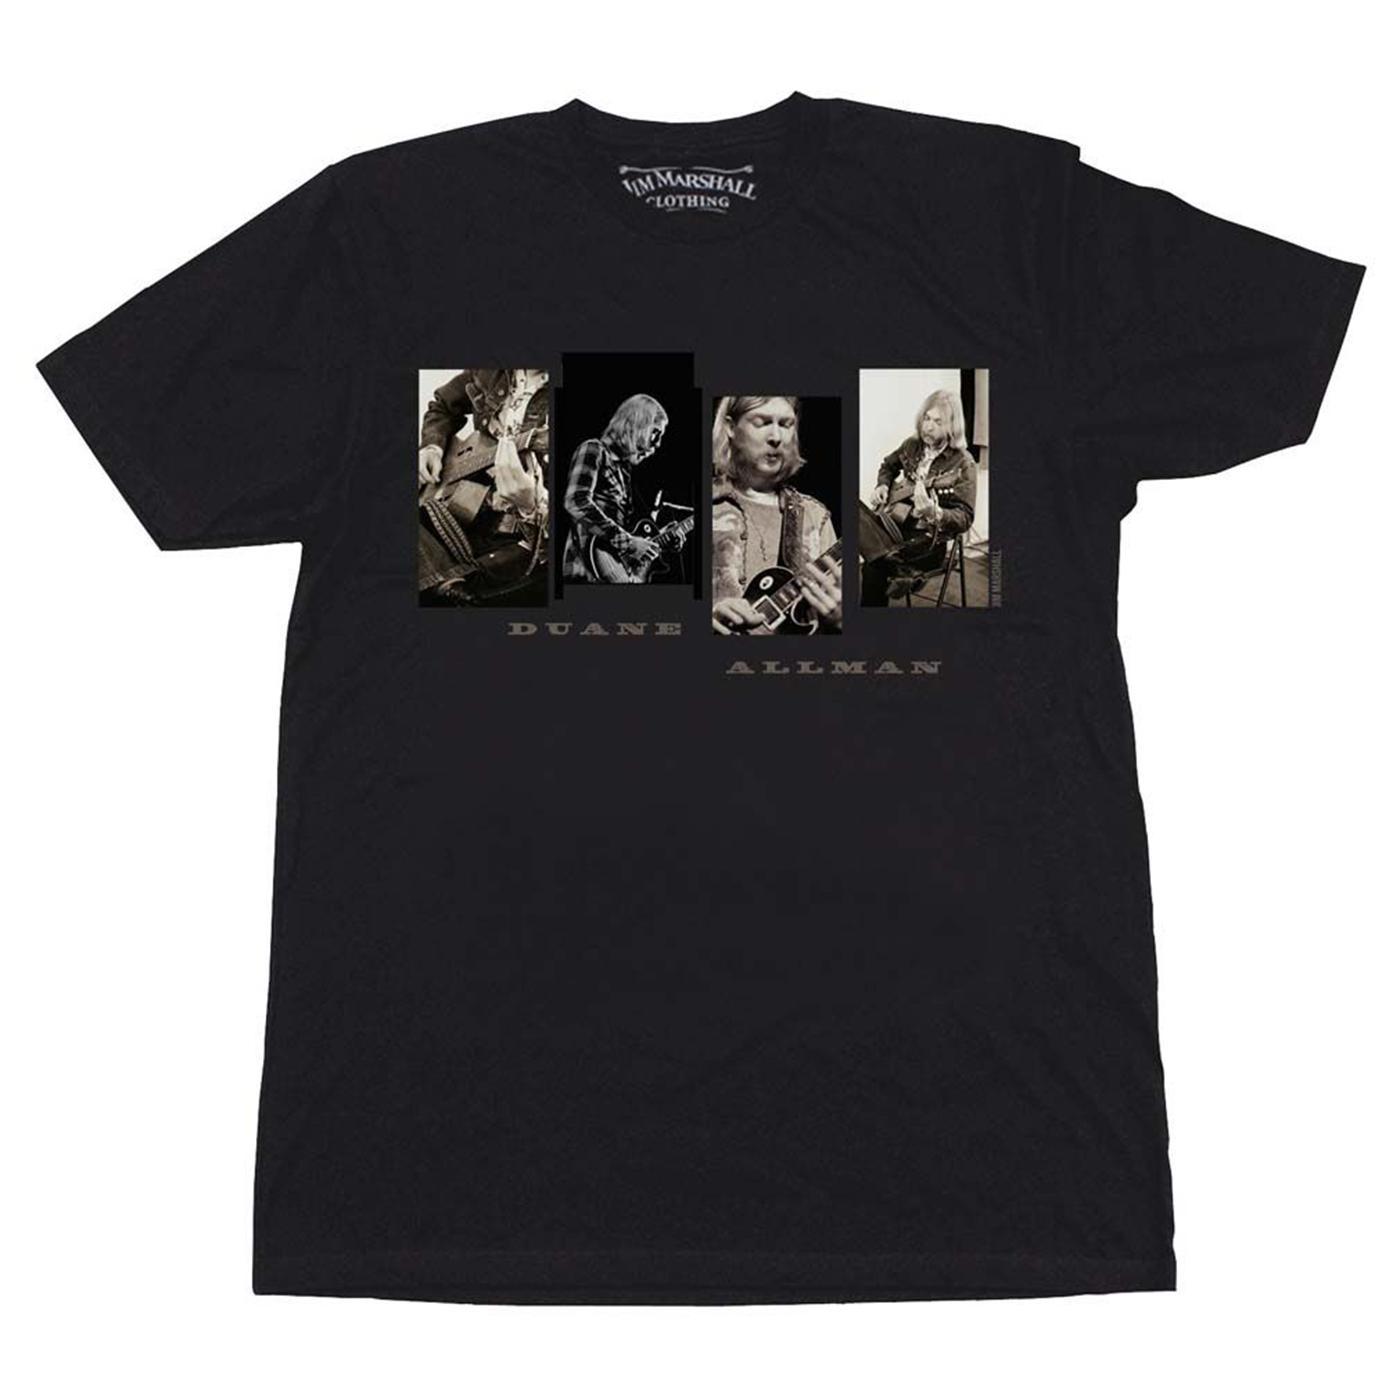 97e9d0bb1 Duane Allman ReEvolution T Shirt High Quality Custom Printed Tops Hipster  Tees T Shirt T Shirts With Prints Humorous Shirts From Shitan1, $11.78|  DHgate.Com